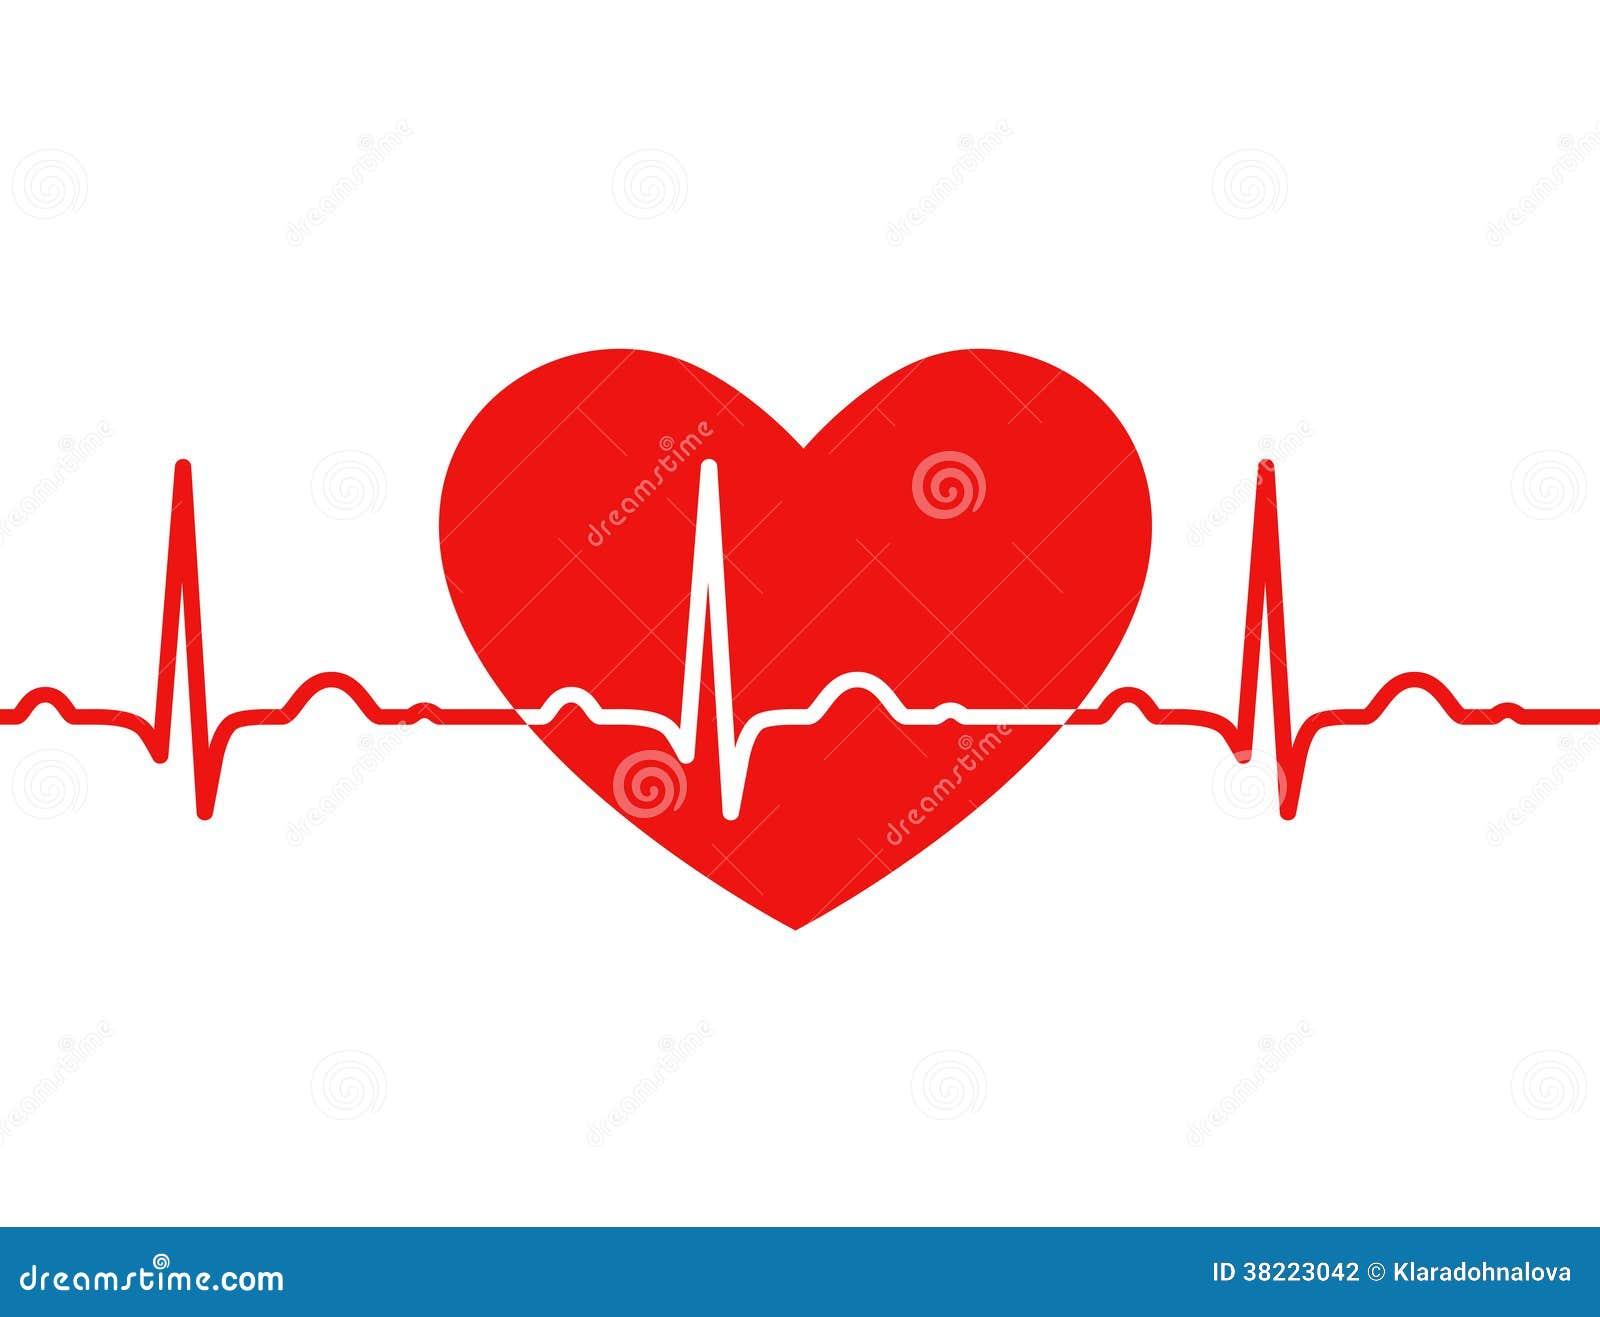 free heart monitor clipart - photo #27